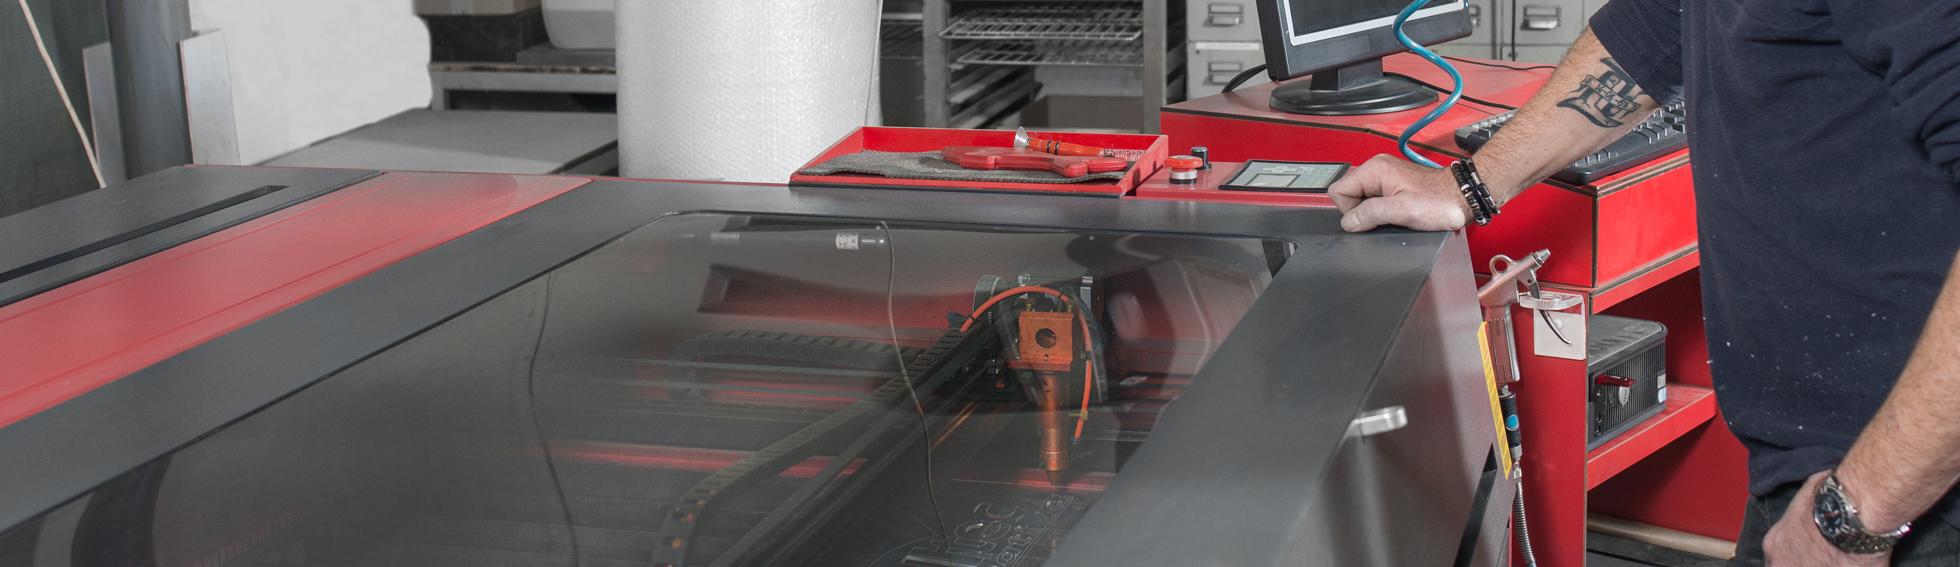 frezen laser snijden